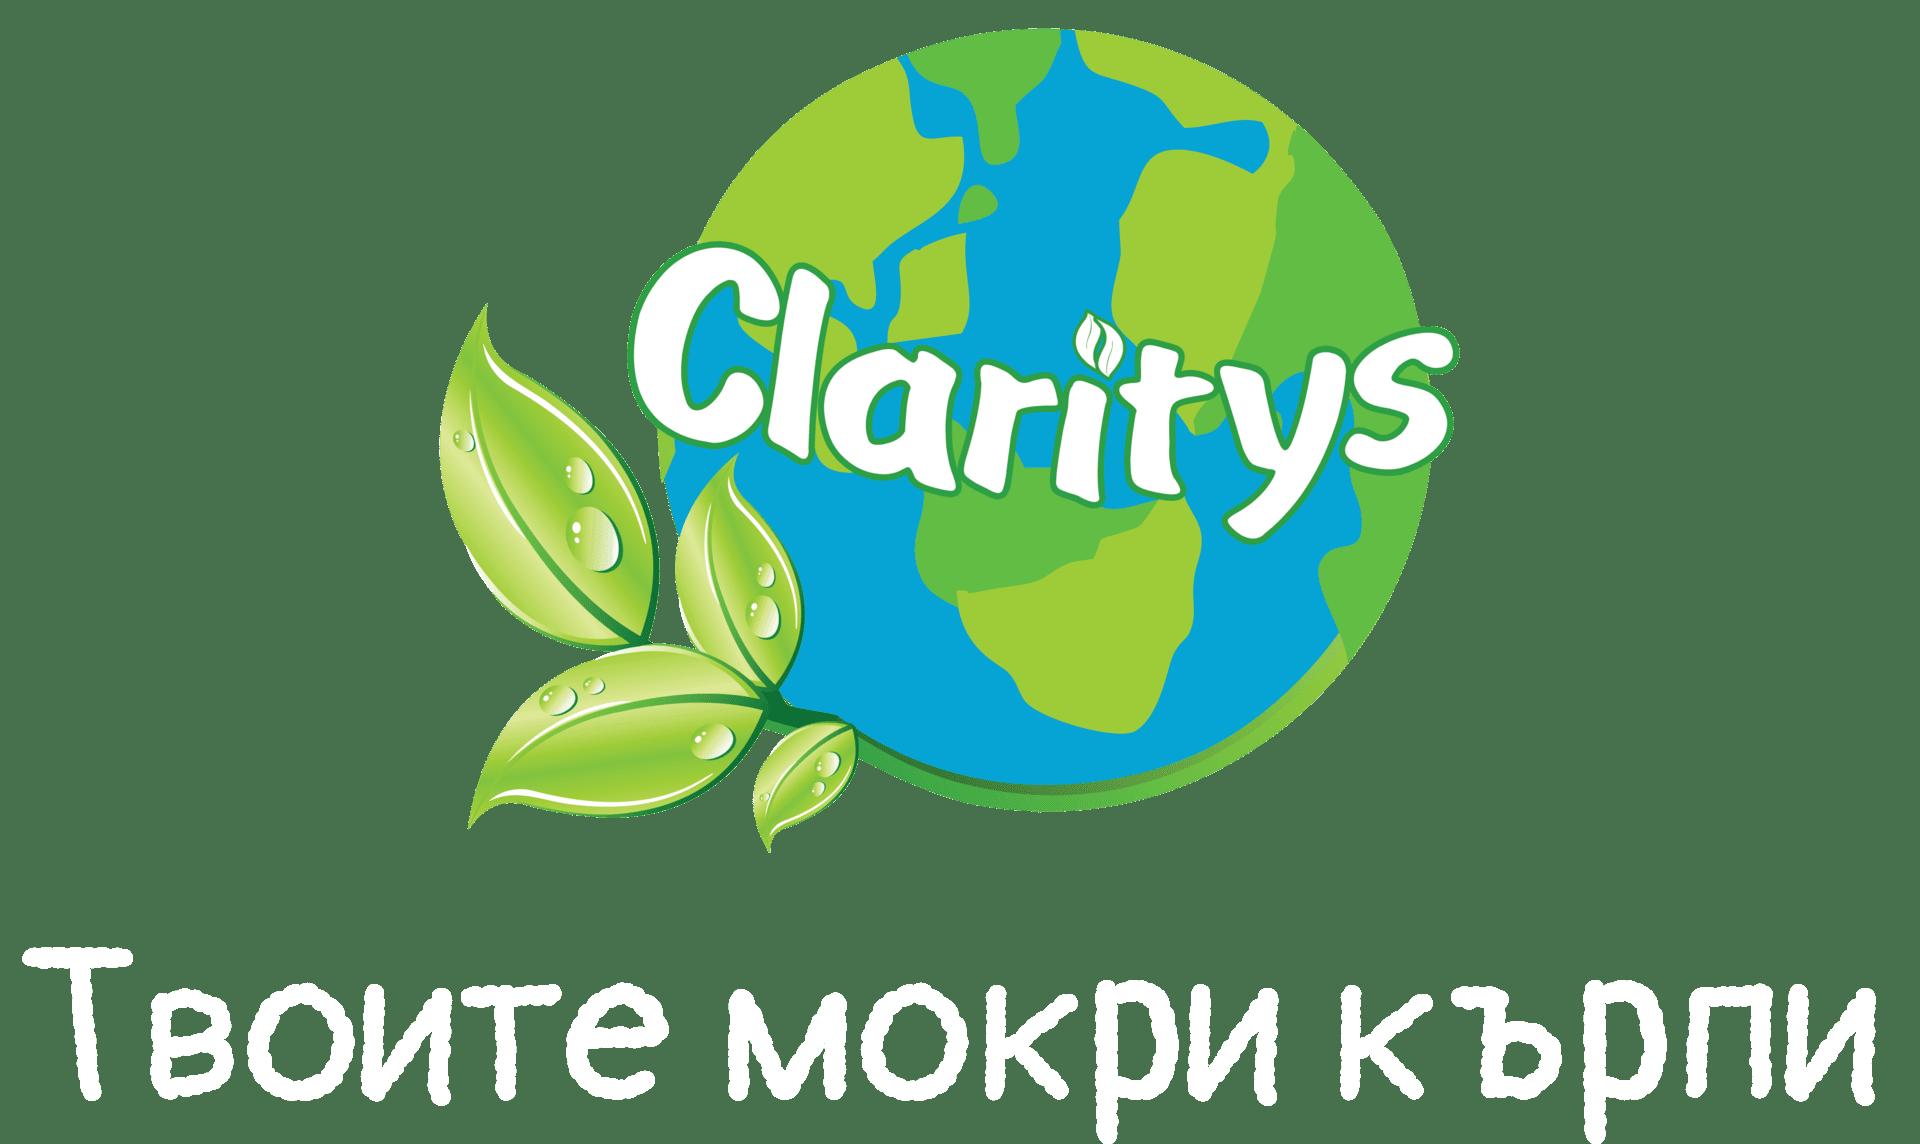 Claritys